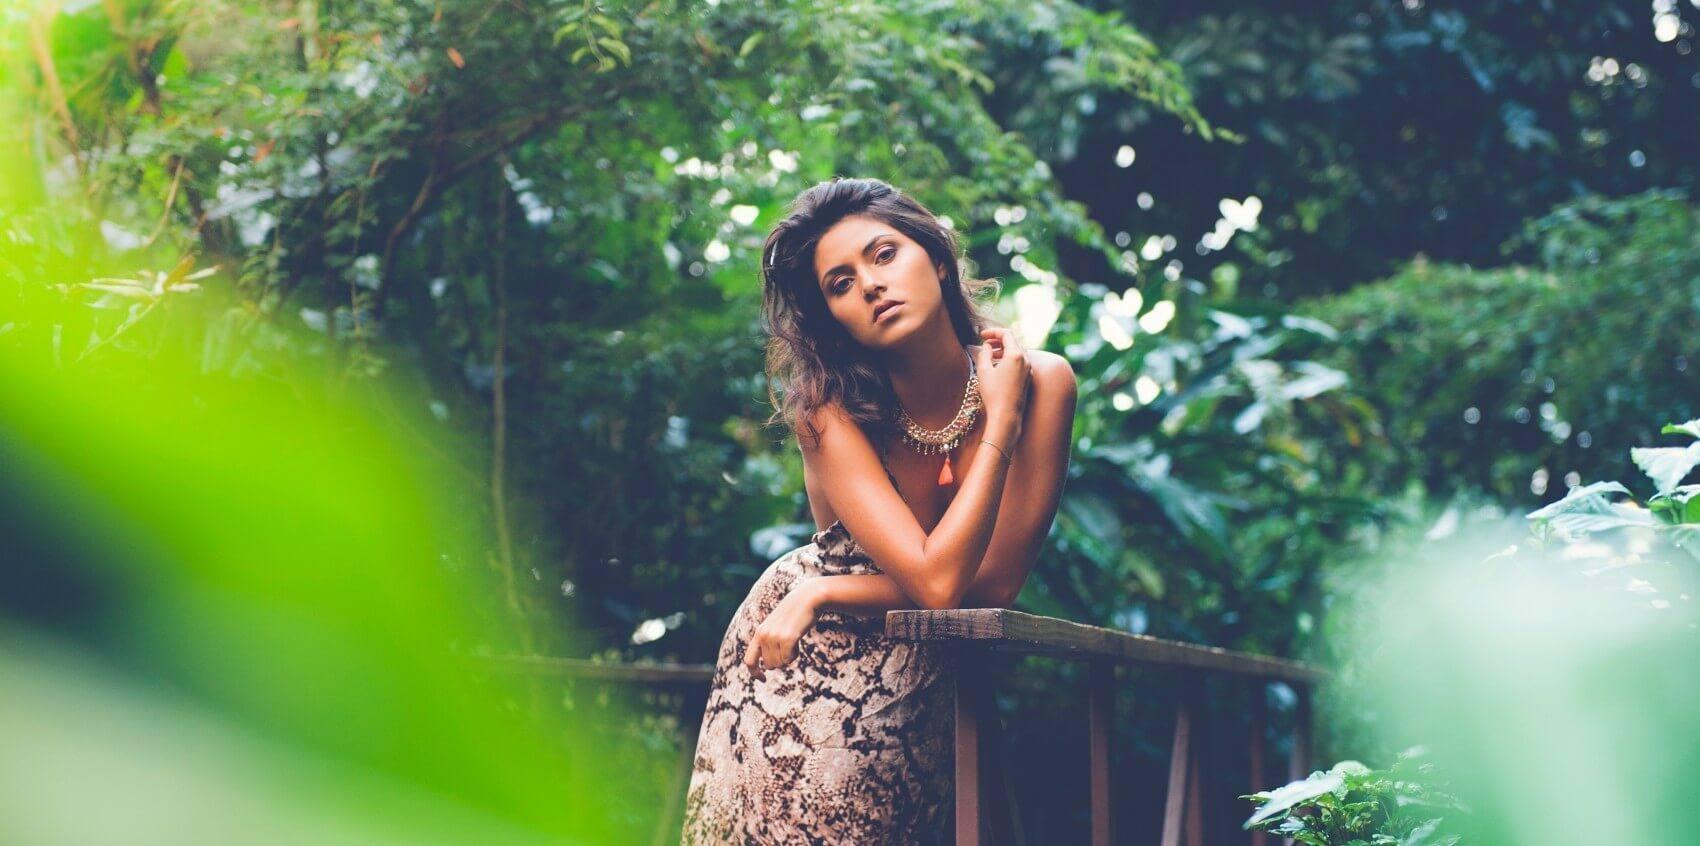 marc-gerard-photographe-mariage-montpellier-reportage-mode-tahiti-1